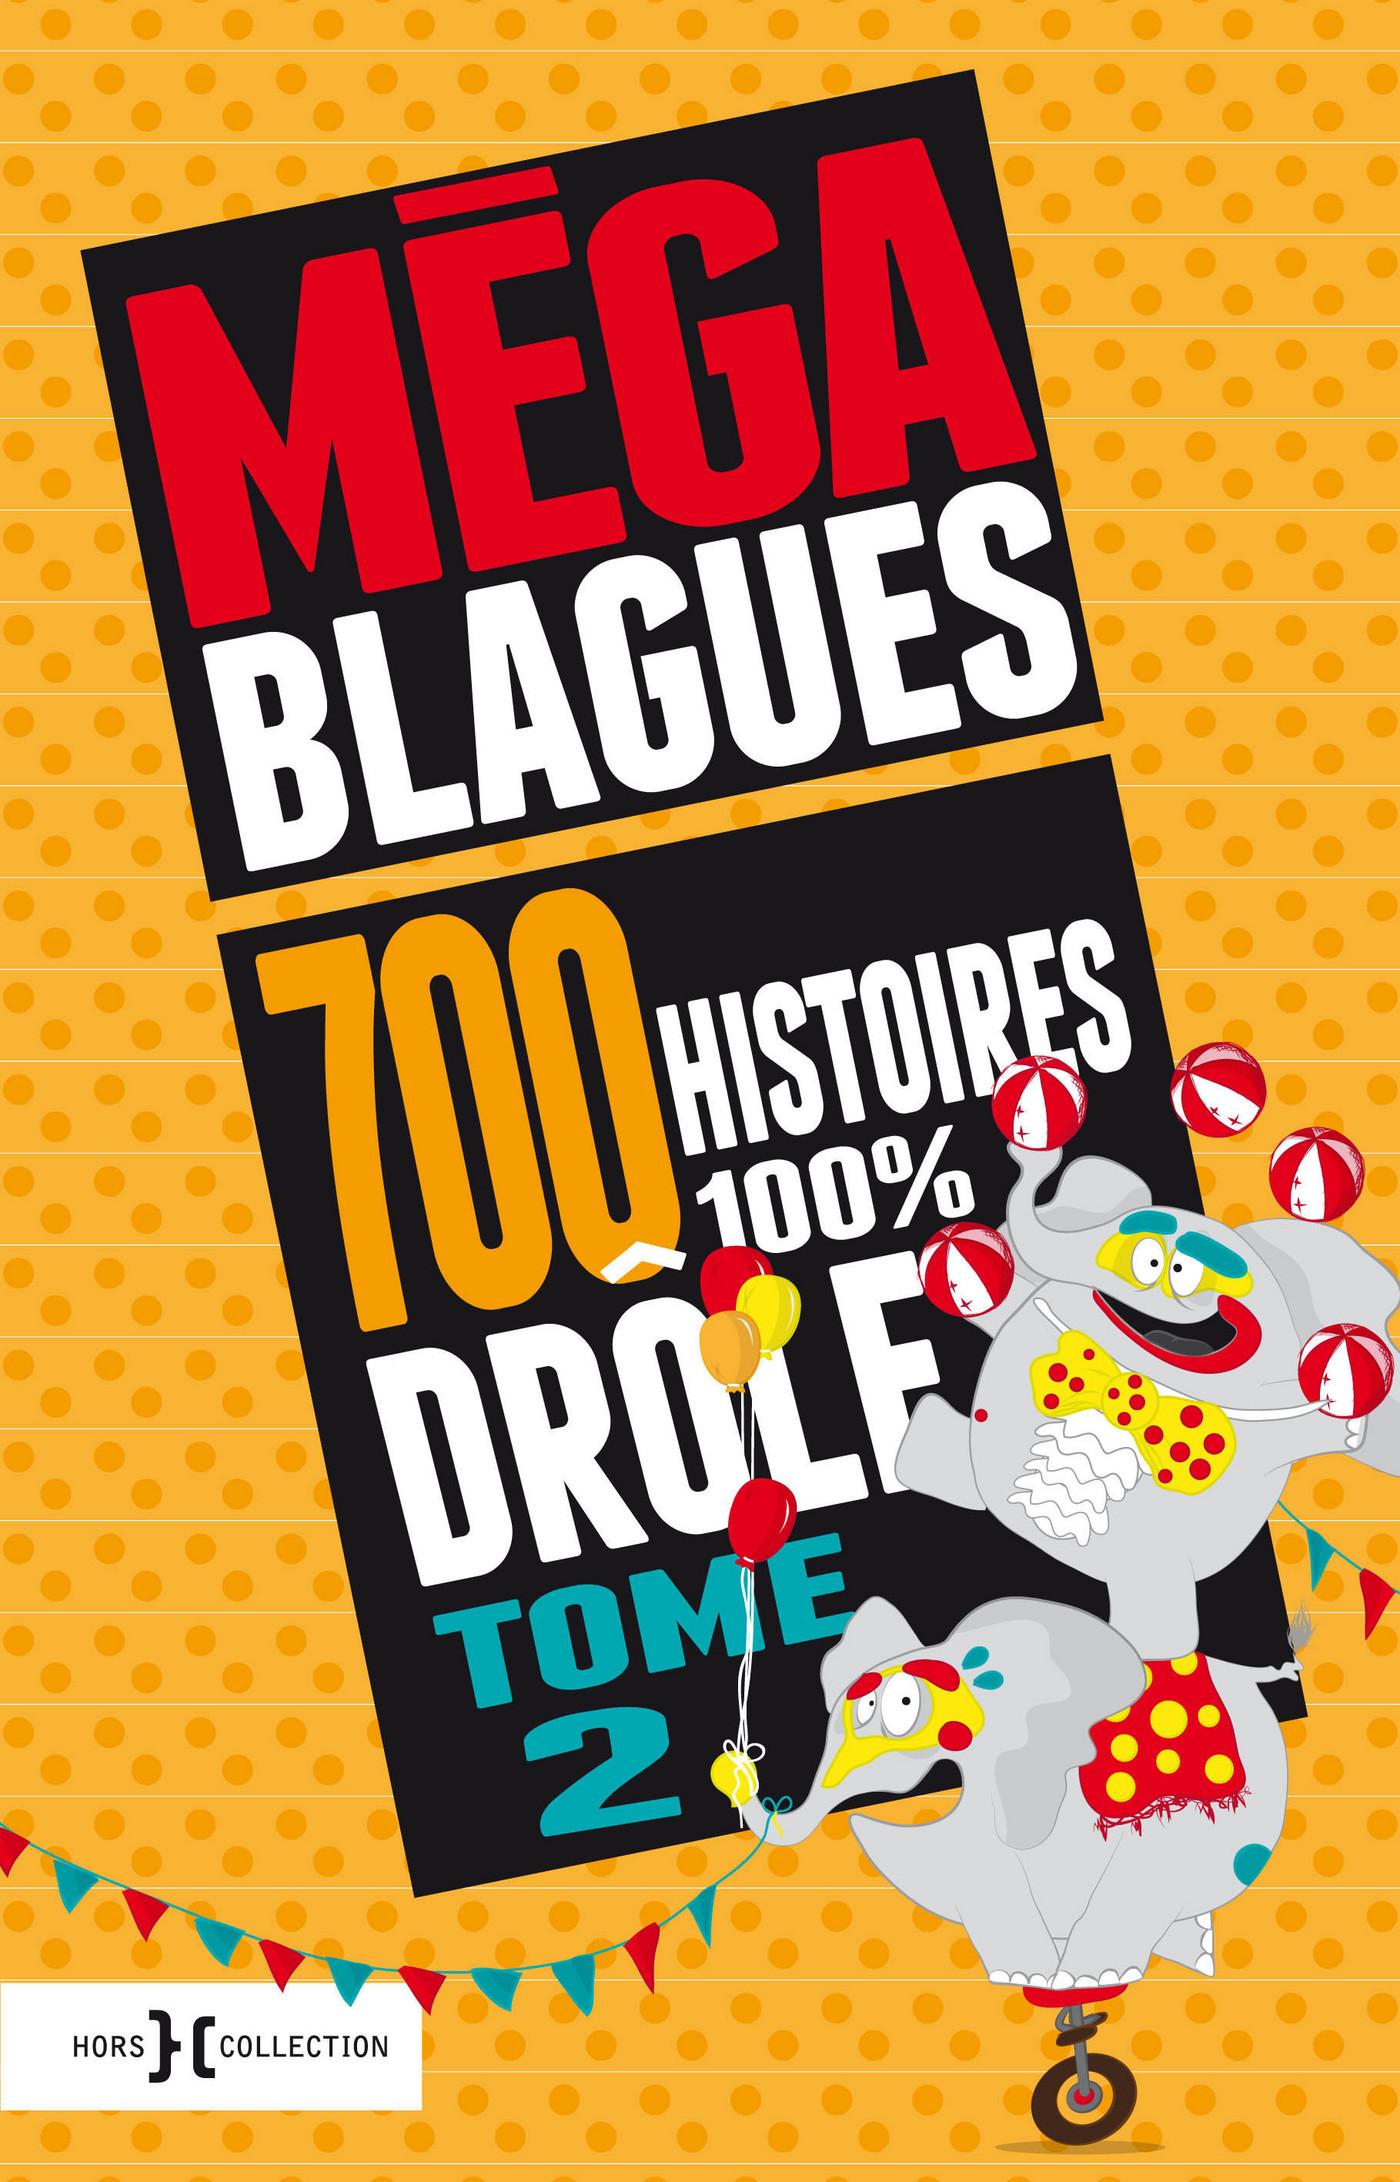 Méga Blagues - 700 histoires 100% drôles (ebook)